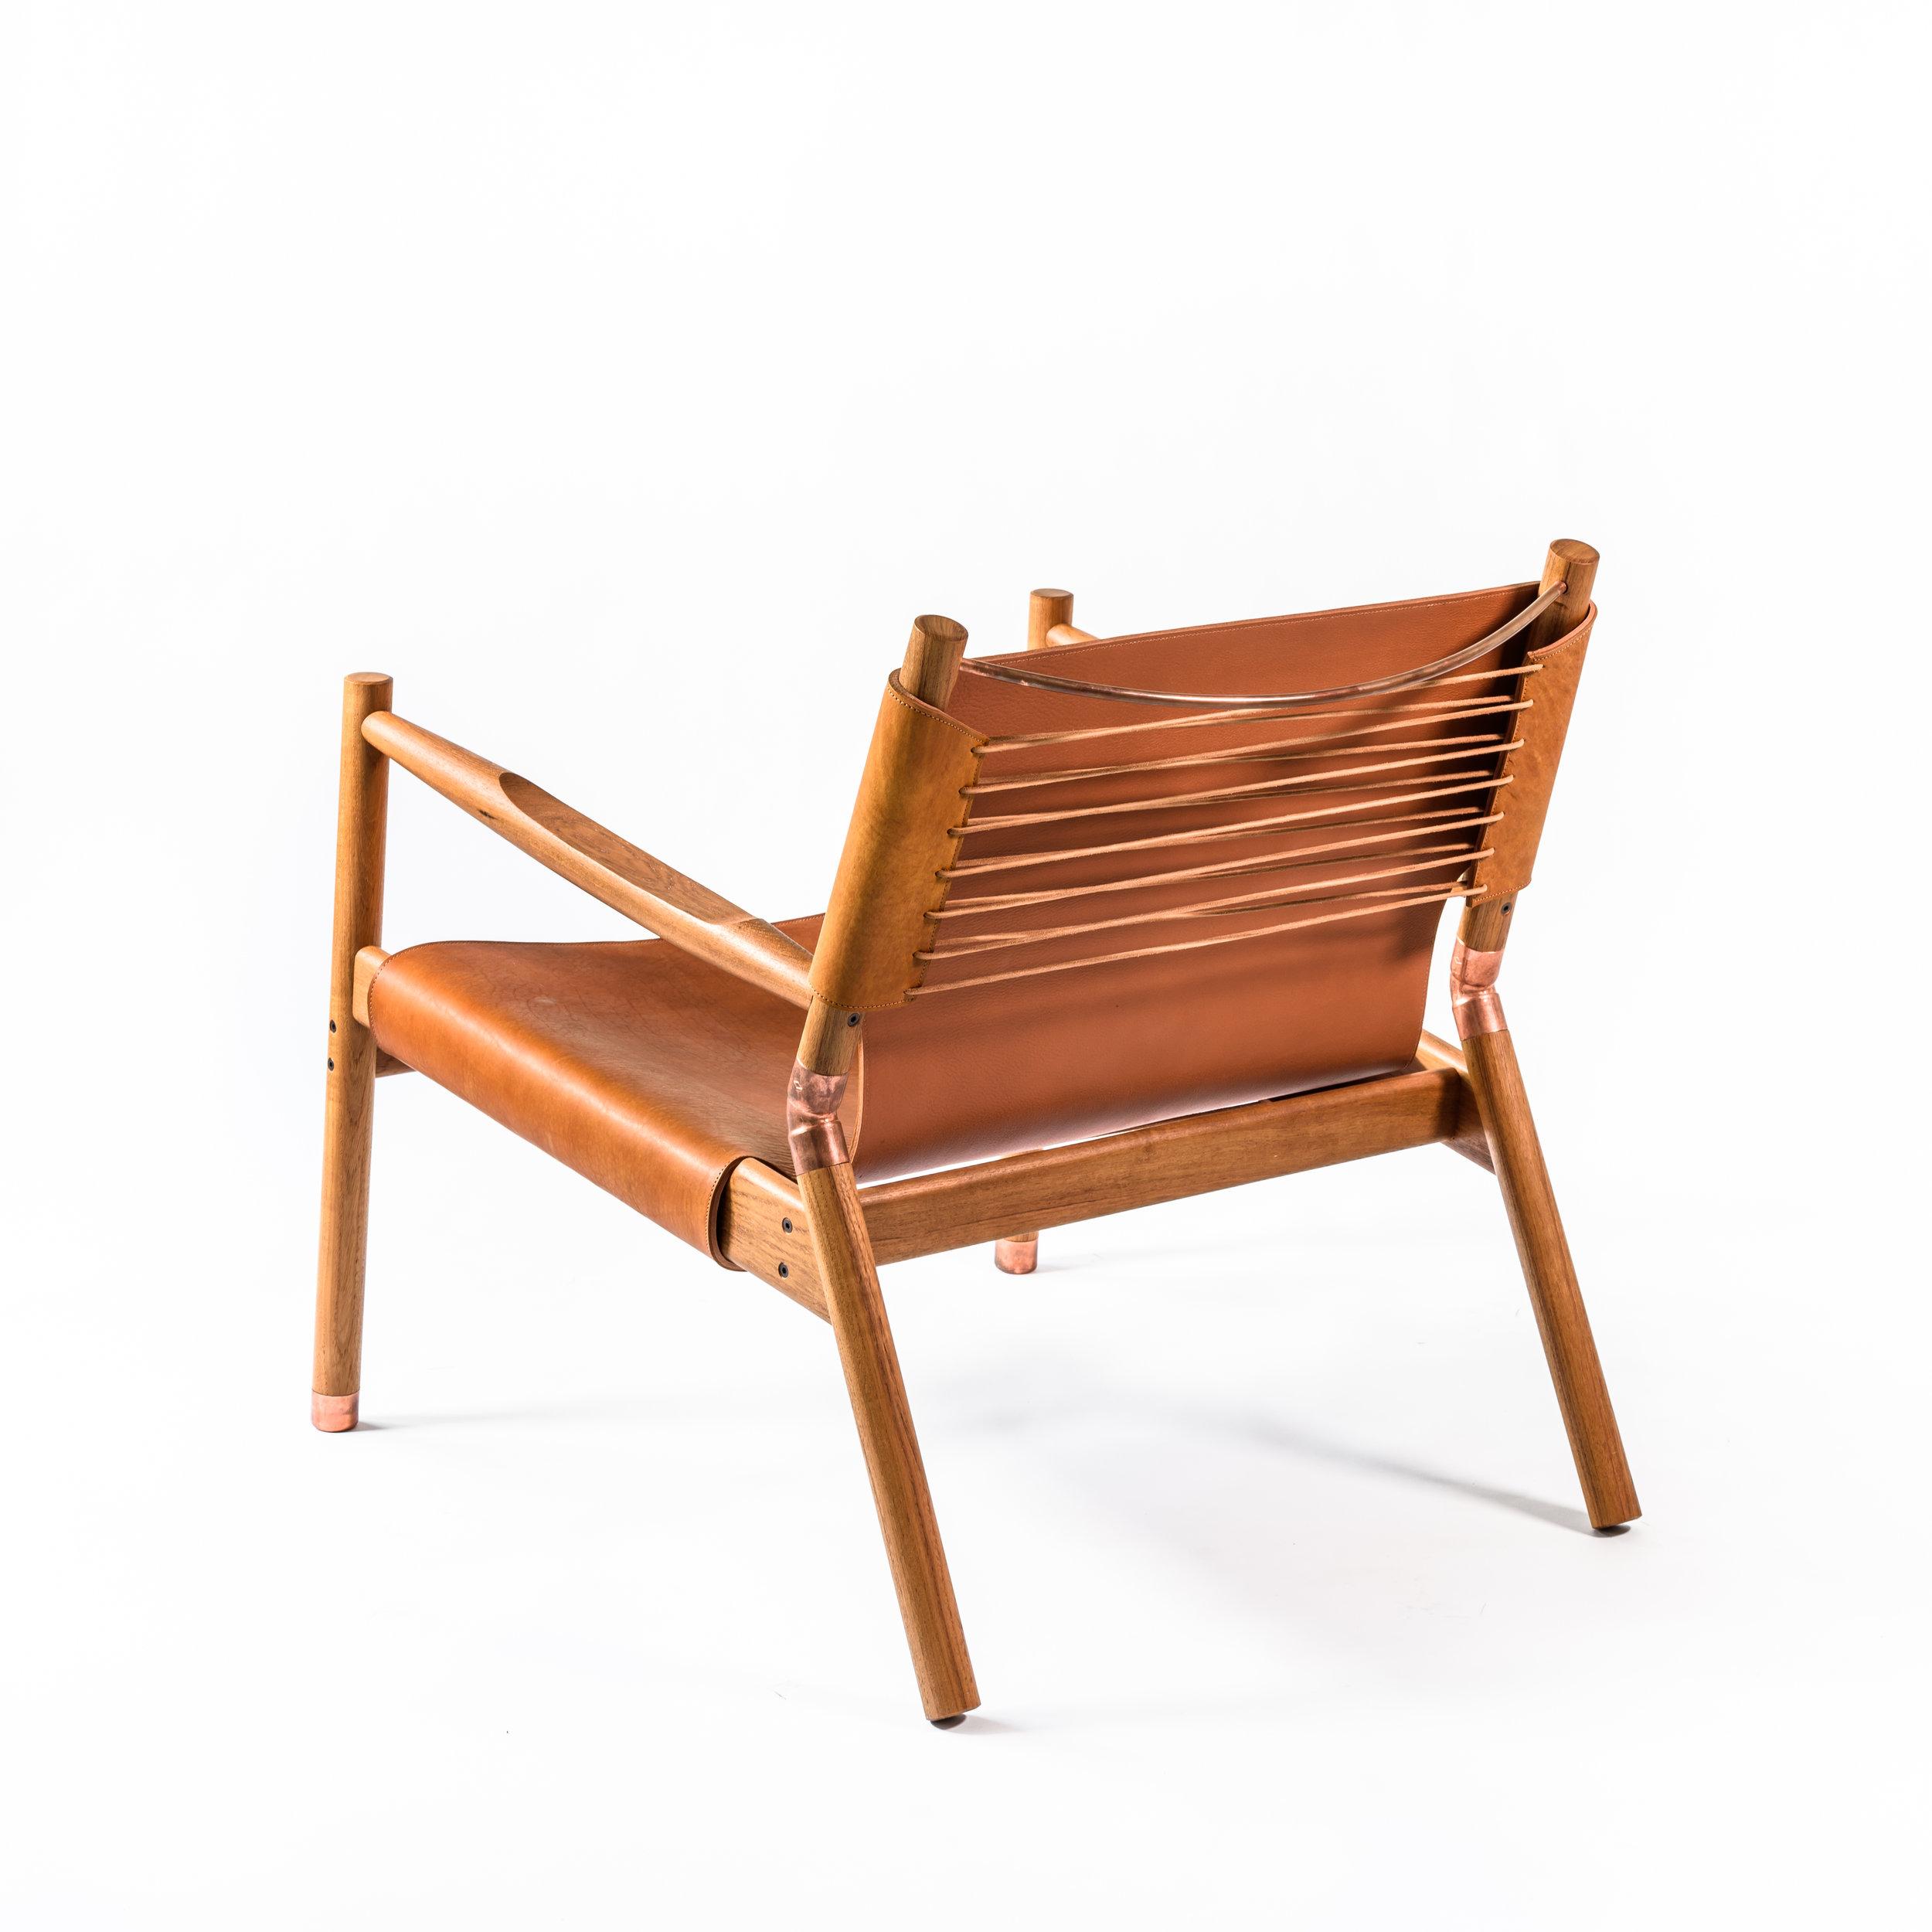 "Saddle leather Teak Raw copper & Leather cord 28""H x 28"" W x 31""D"